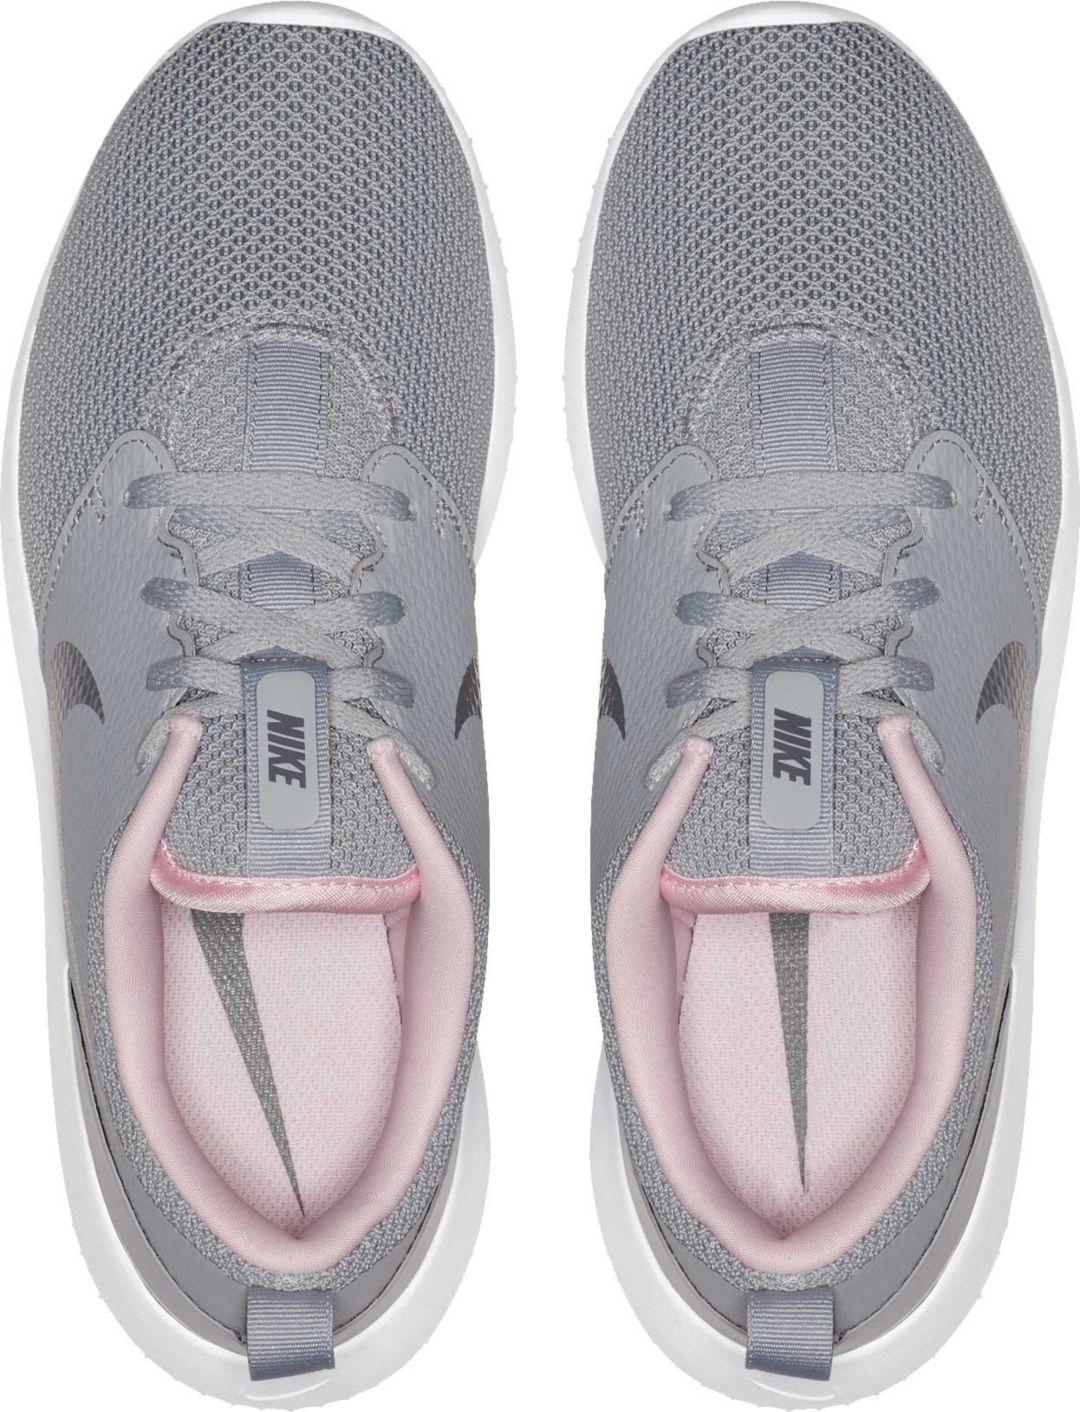 a3cb141b1a8c Nike Women s Roshe G Golf Shoes 3